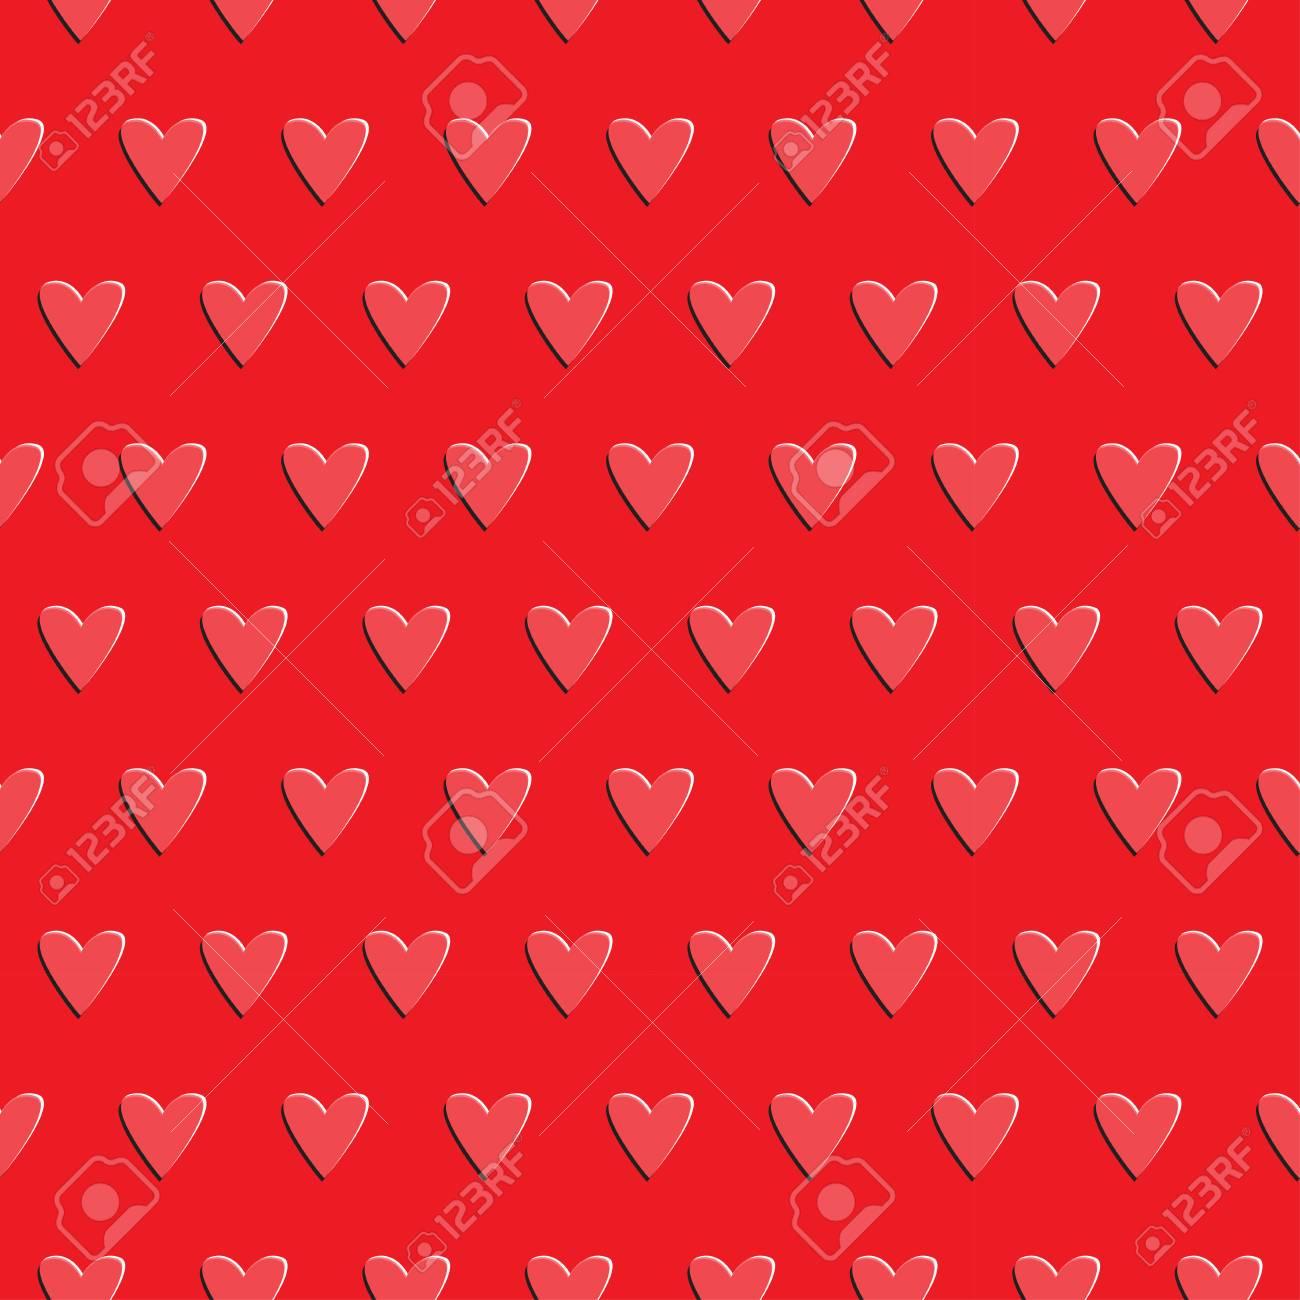 Charmant Häkeln Rotes Herz Muster Bilder - Strickmuster-Ideen ...